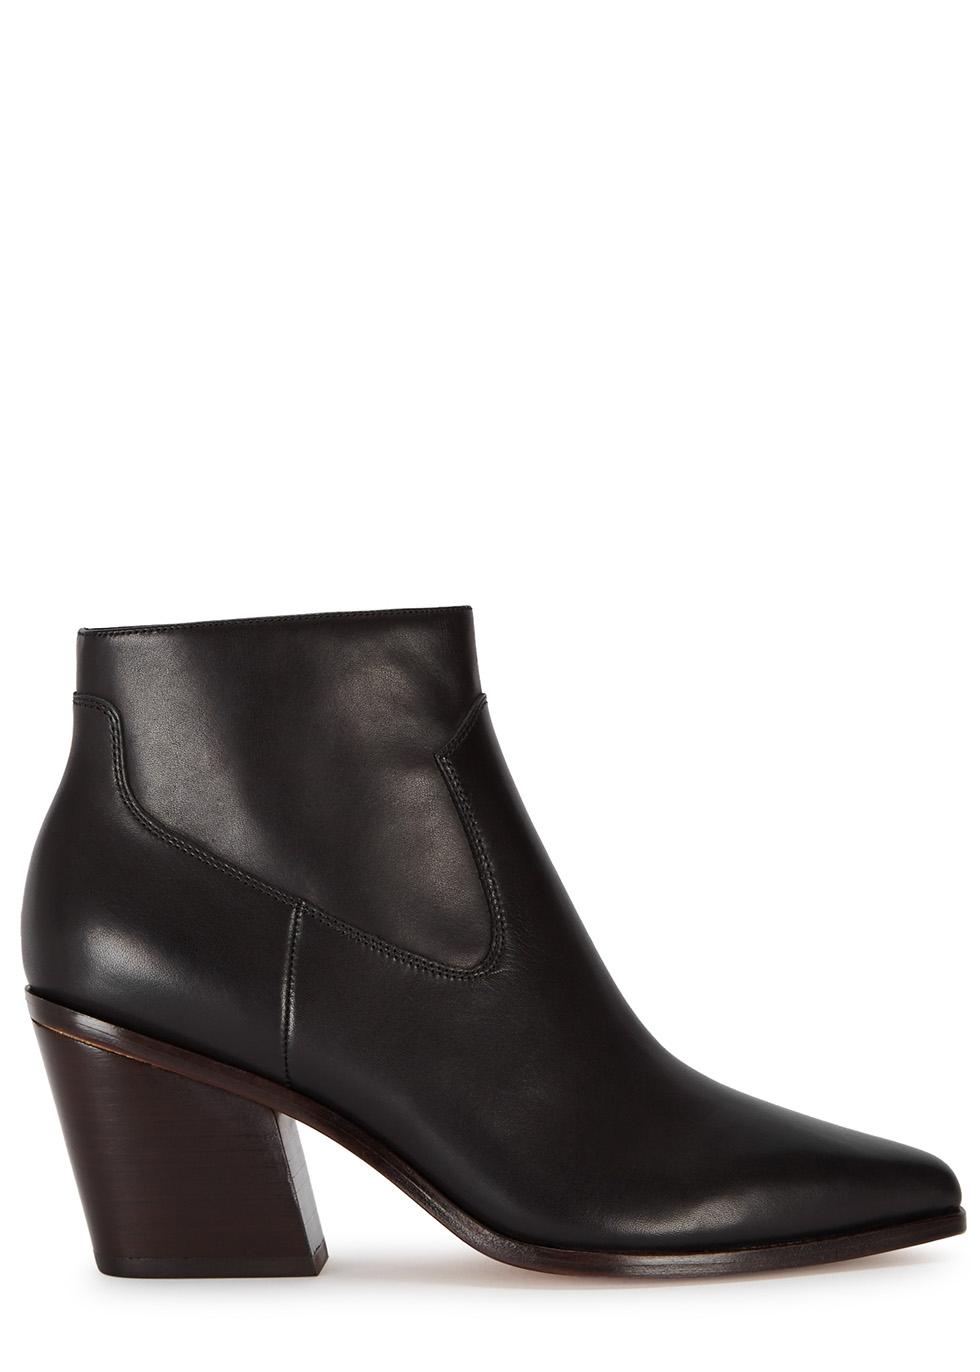 Razor 90 black leather ankle boots - rag & bone